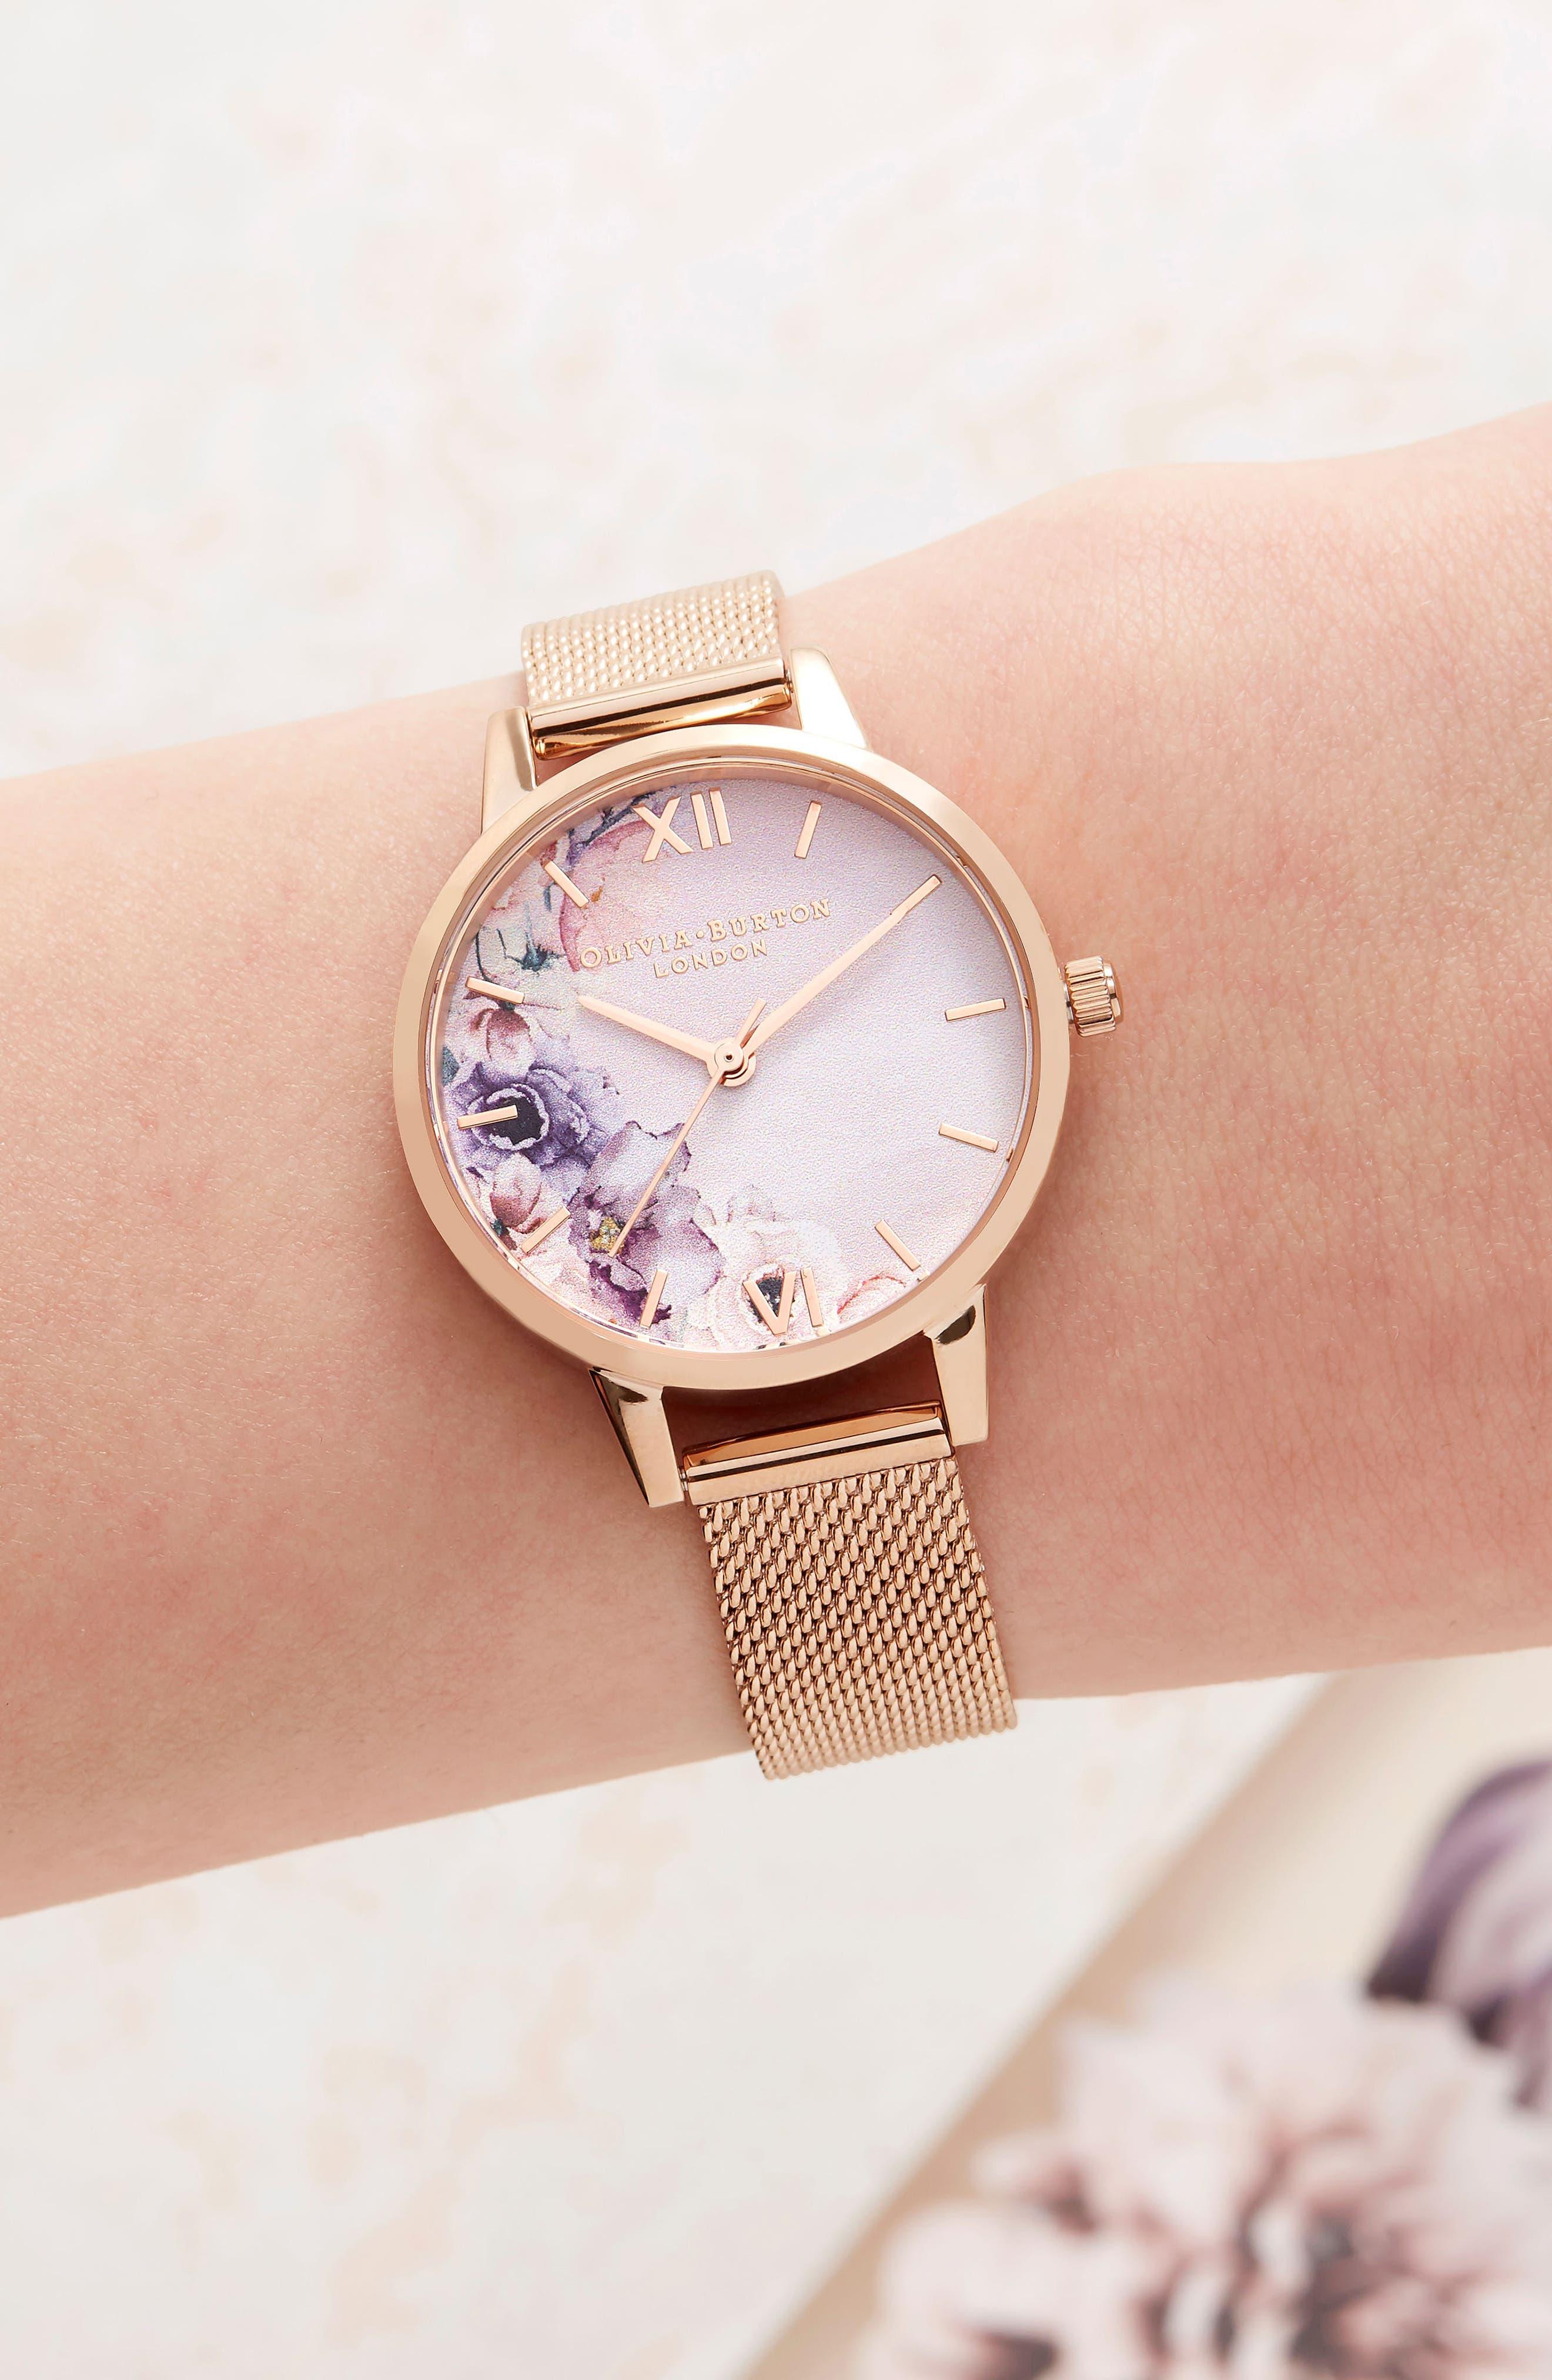 OLIVIA BURTON, Watercolour Florals Mesh Strap Watch, 30mm, Alternate thumbnail 2, color, ROSE GOLD/ WHITE / ROSE GOLD